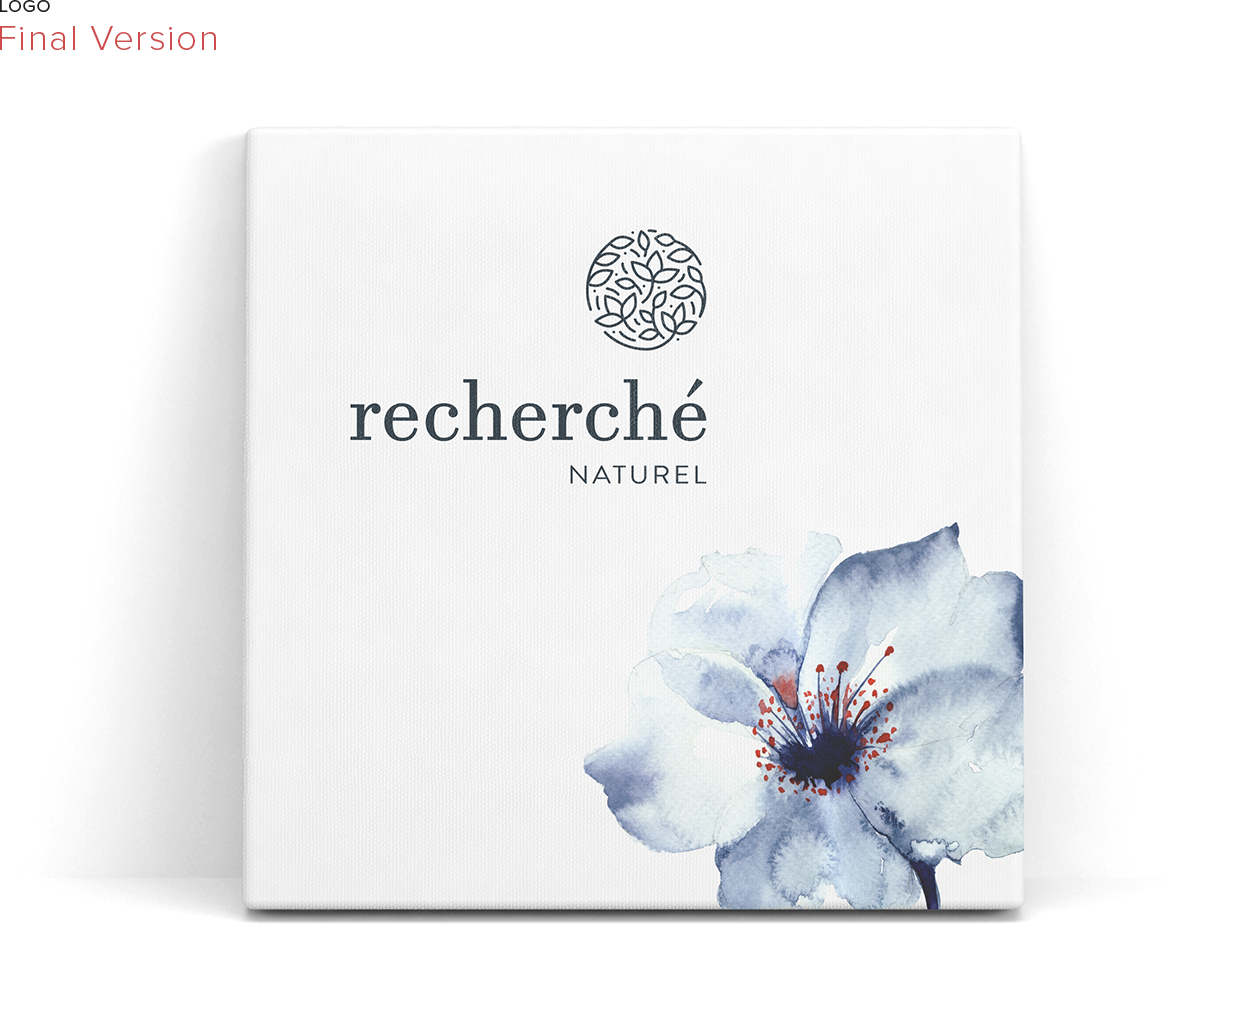 https://media.authentic-studio.com/web-content/uploads/2020/11/selected-final-logo-version-for-cosmetics-brand.jpg